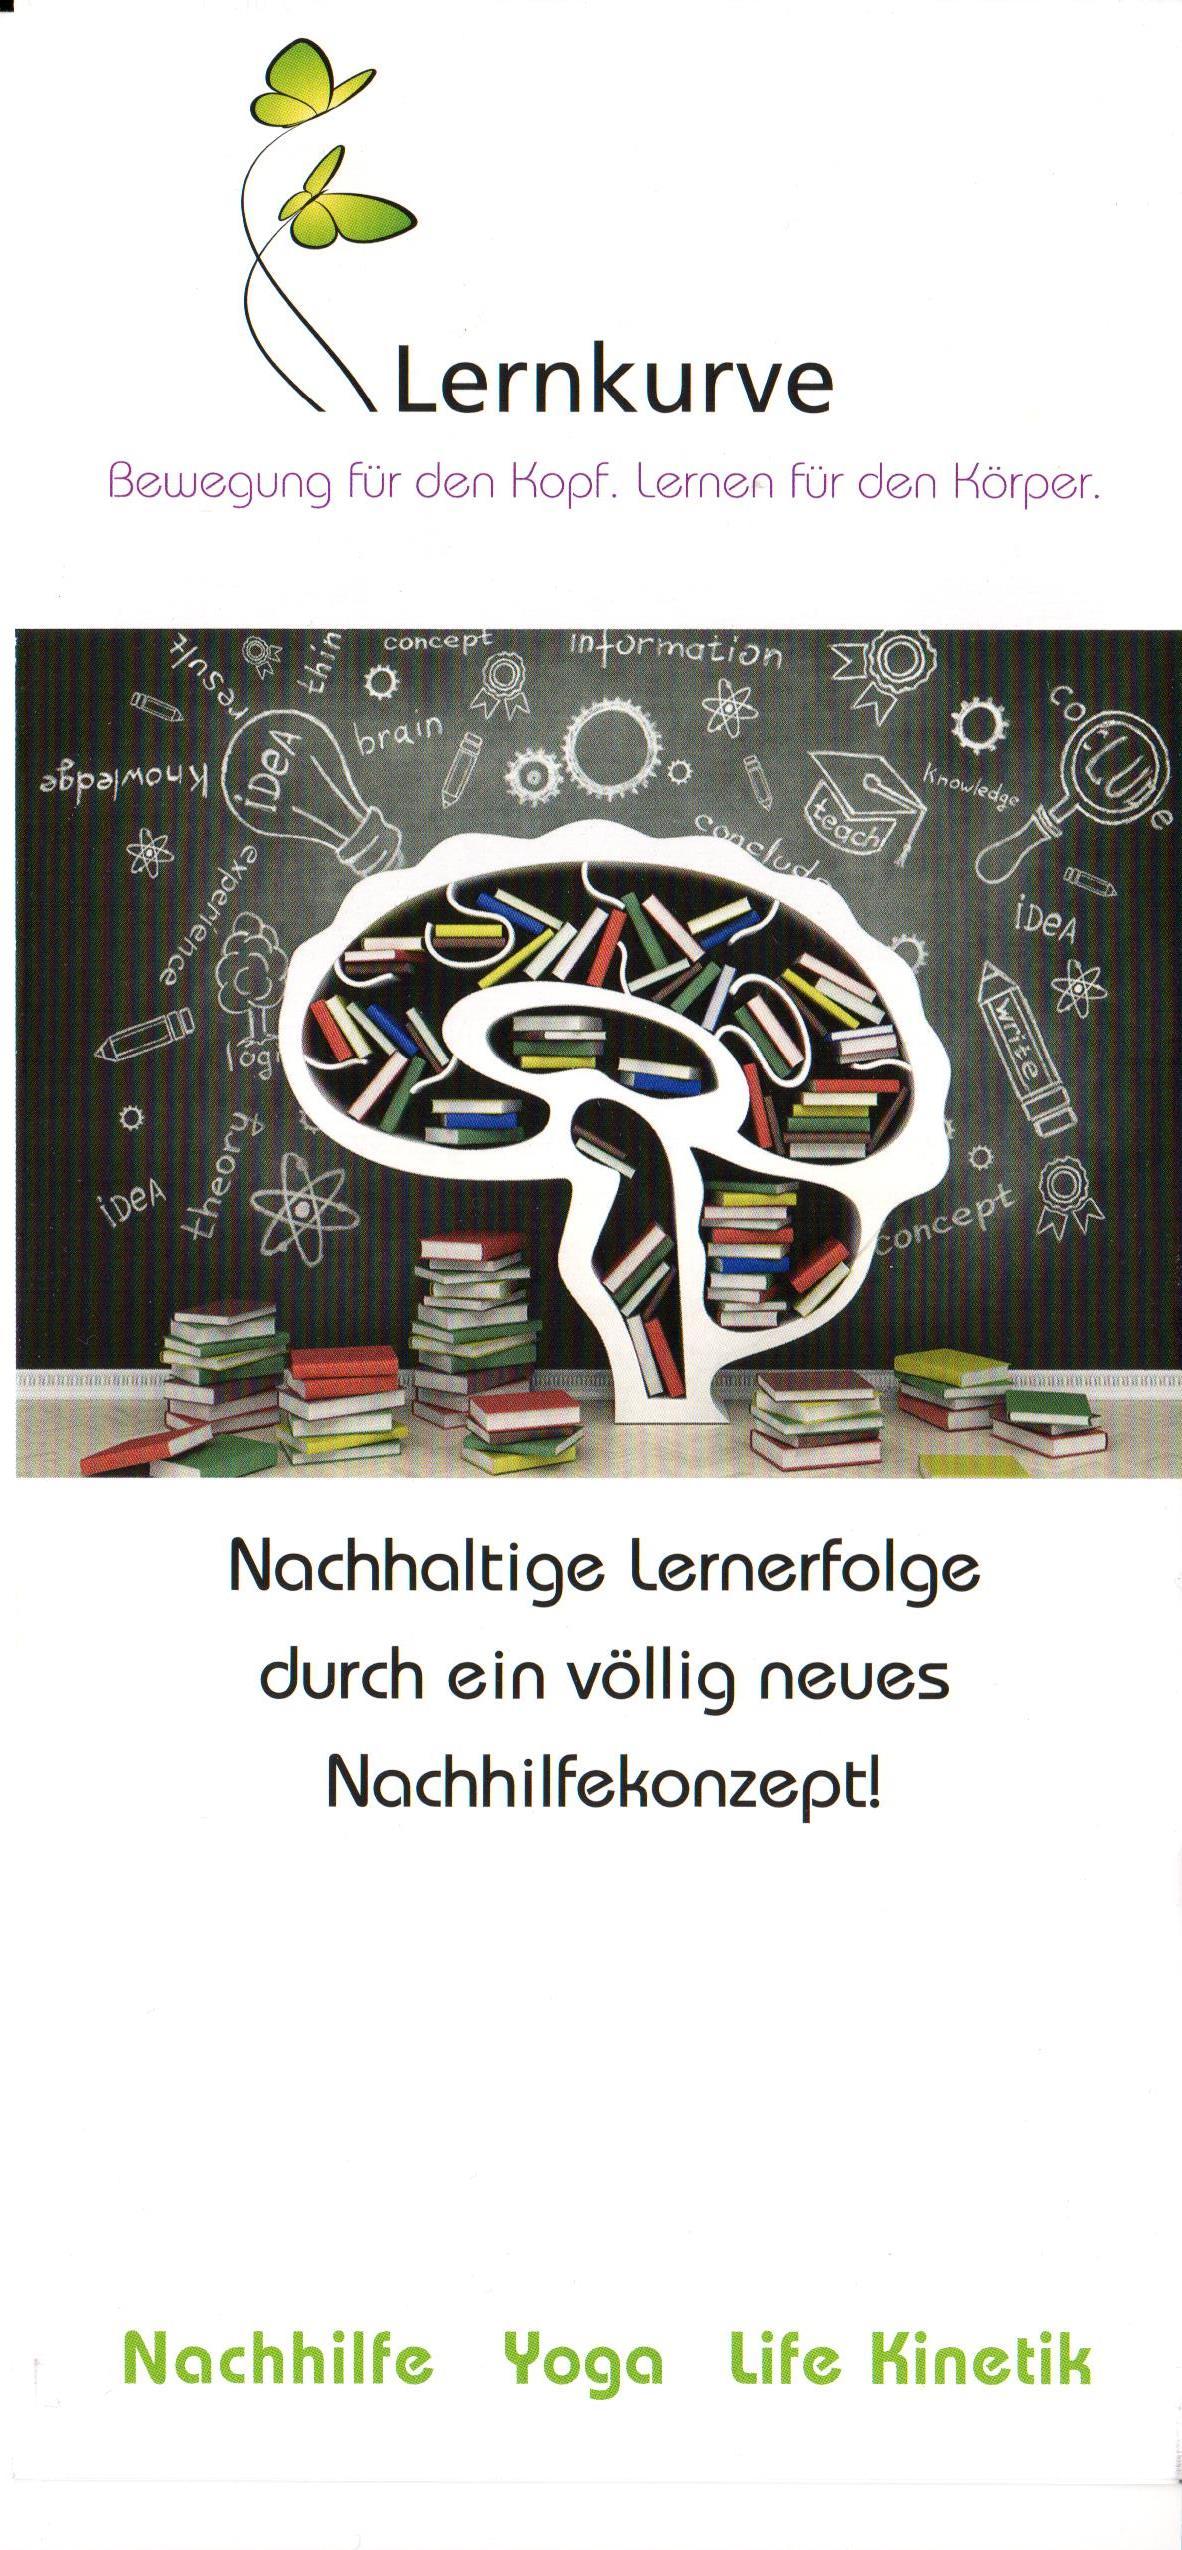 Lernkurve Nachhilfe Eva Schöllhammer